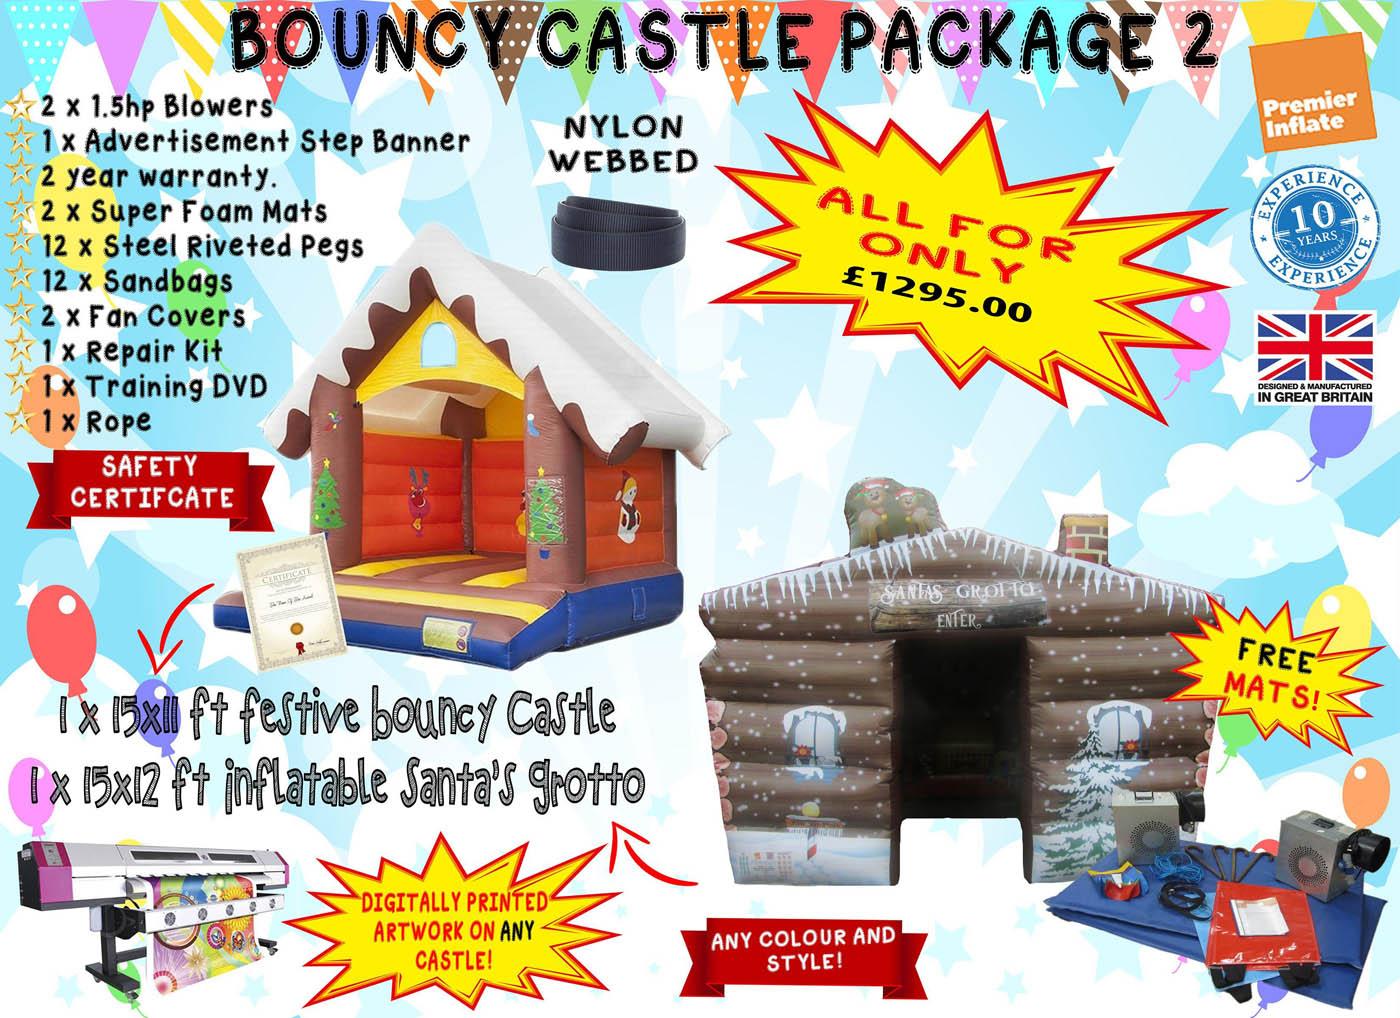 UK Bouncy Castle Package Deals for Sale